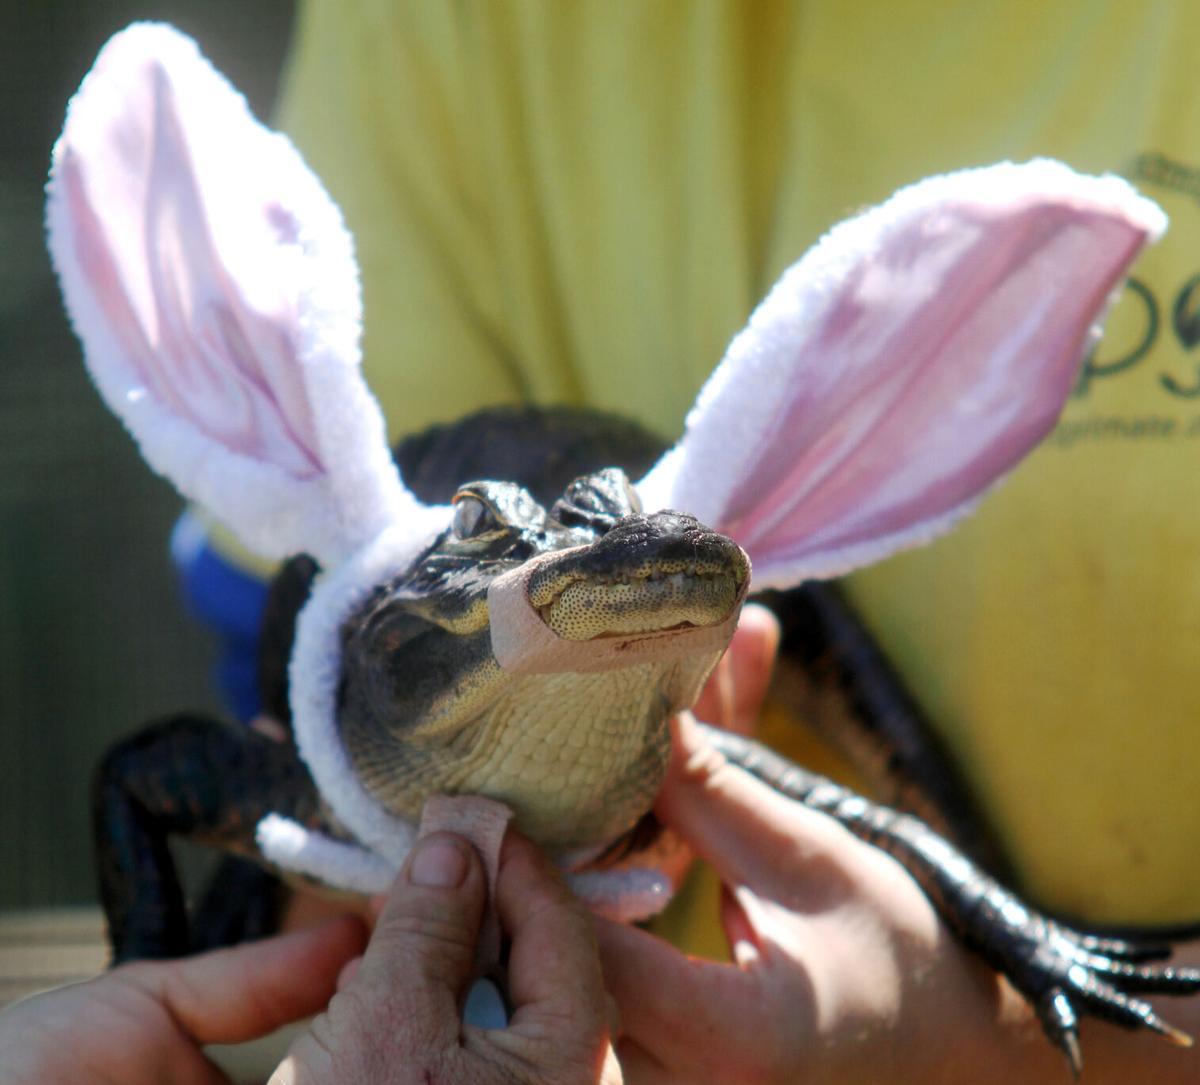 Suncoast Primate Sanctuary's Easter Egg Hunt